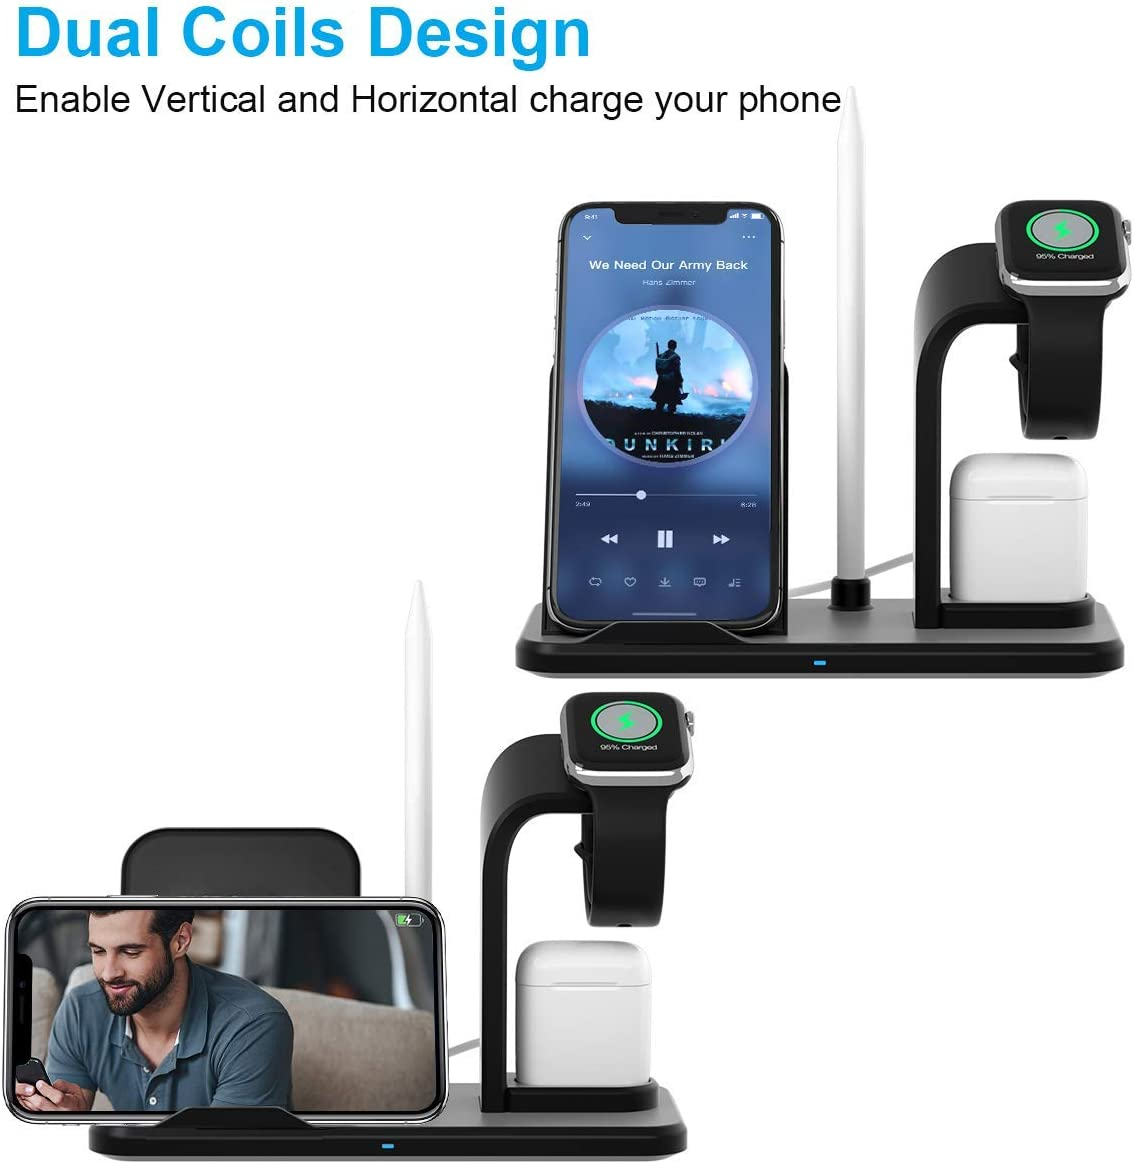 YAYY Soporte Base de Carga para iPhone AirPods Watch